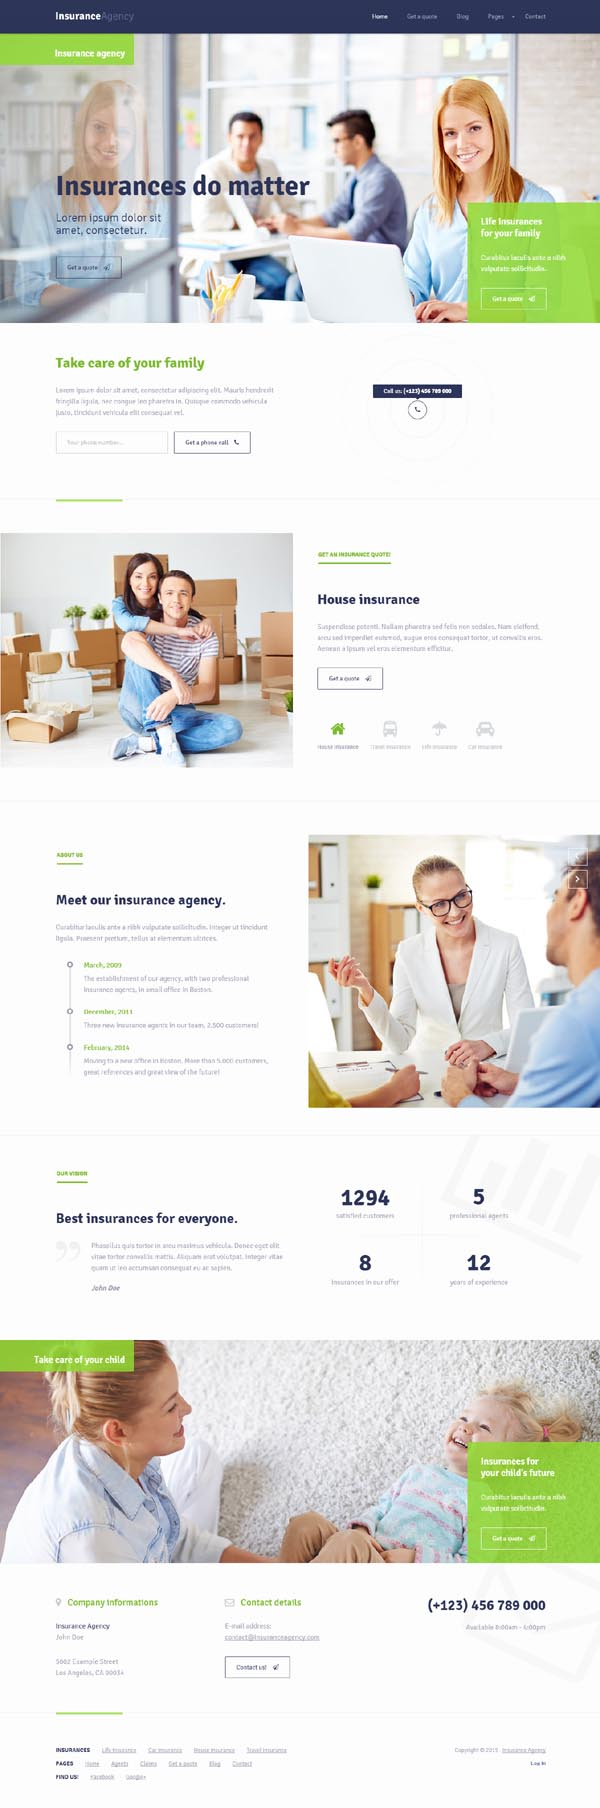 Insurance - HTML5 template for Insurance Agency